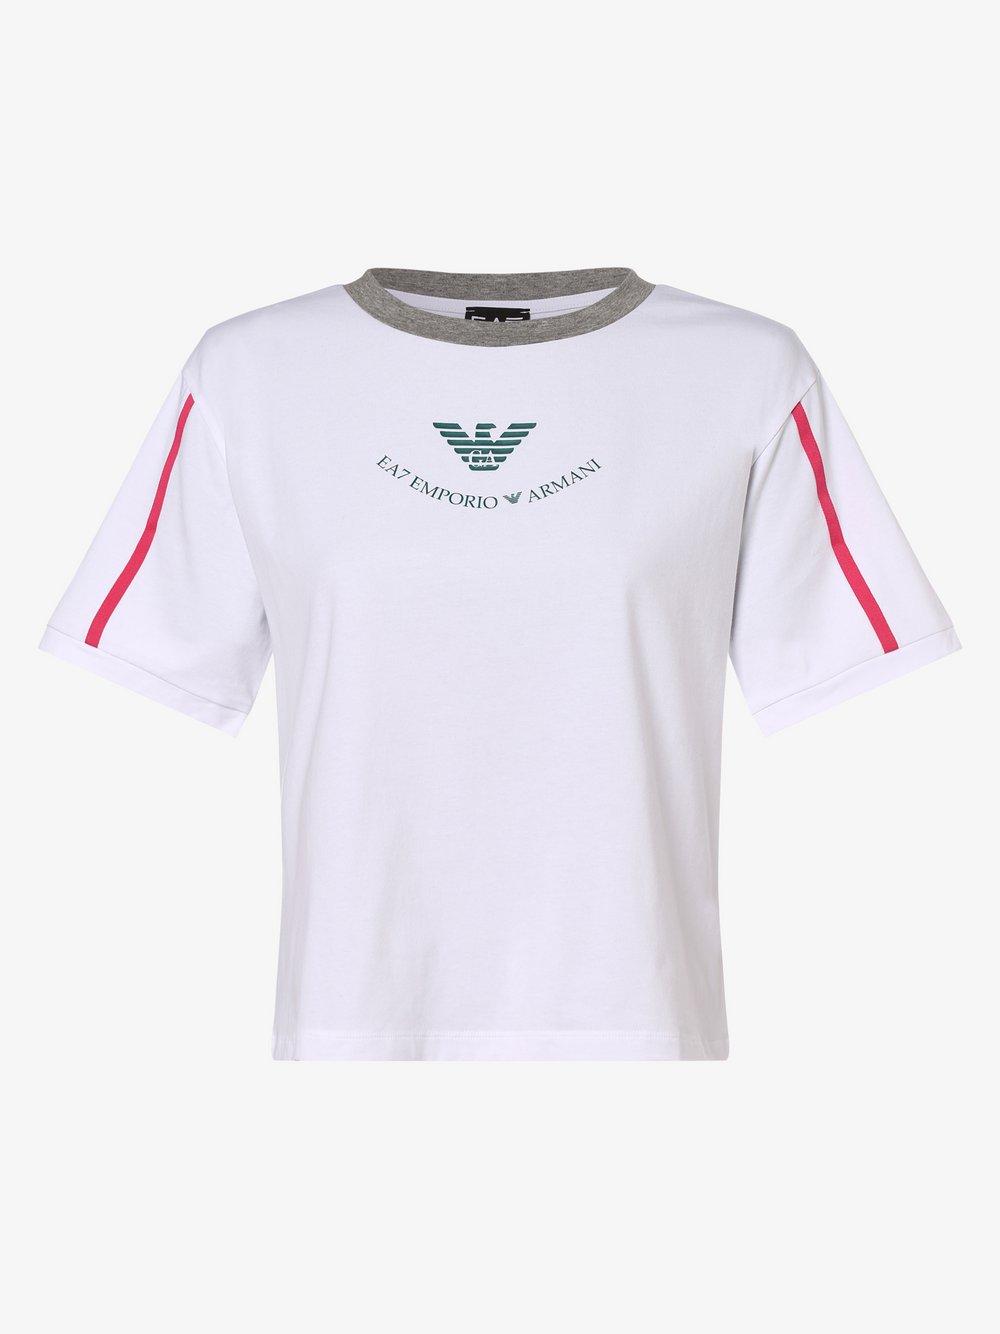 EA7 Emporio Armani - T-shirt damski, biały